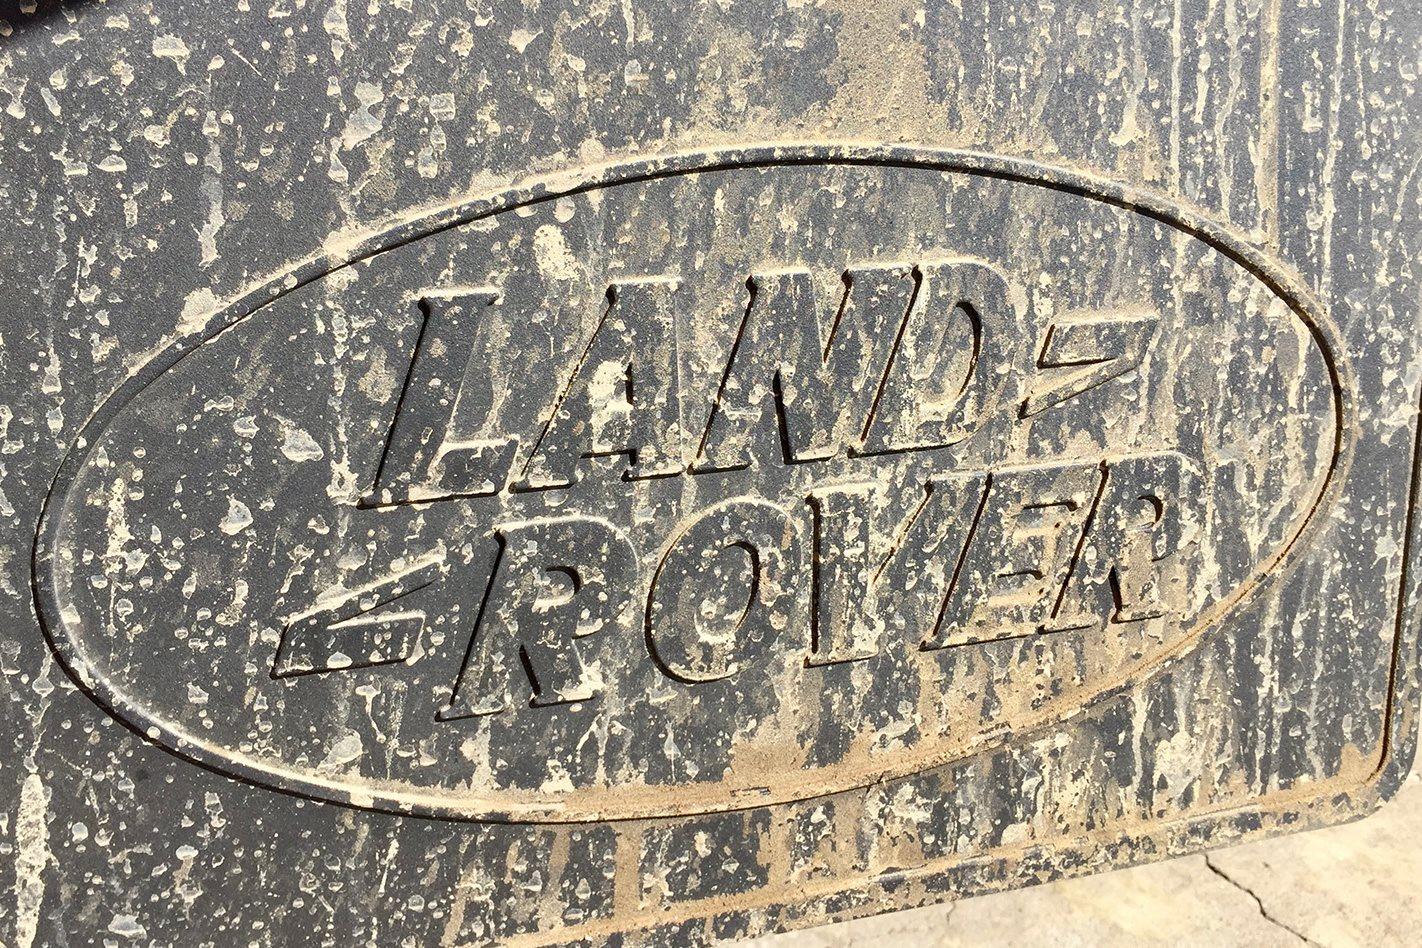 Land-Rover-mud-flaps.jpg